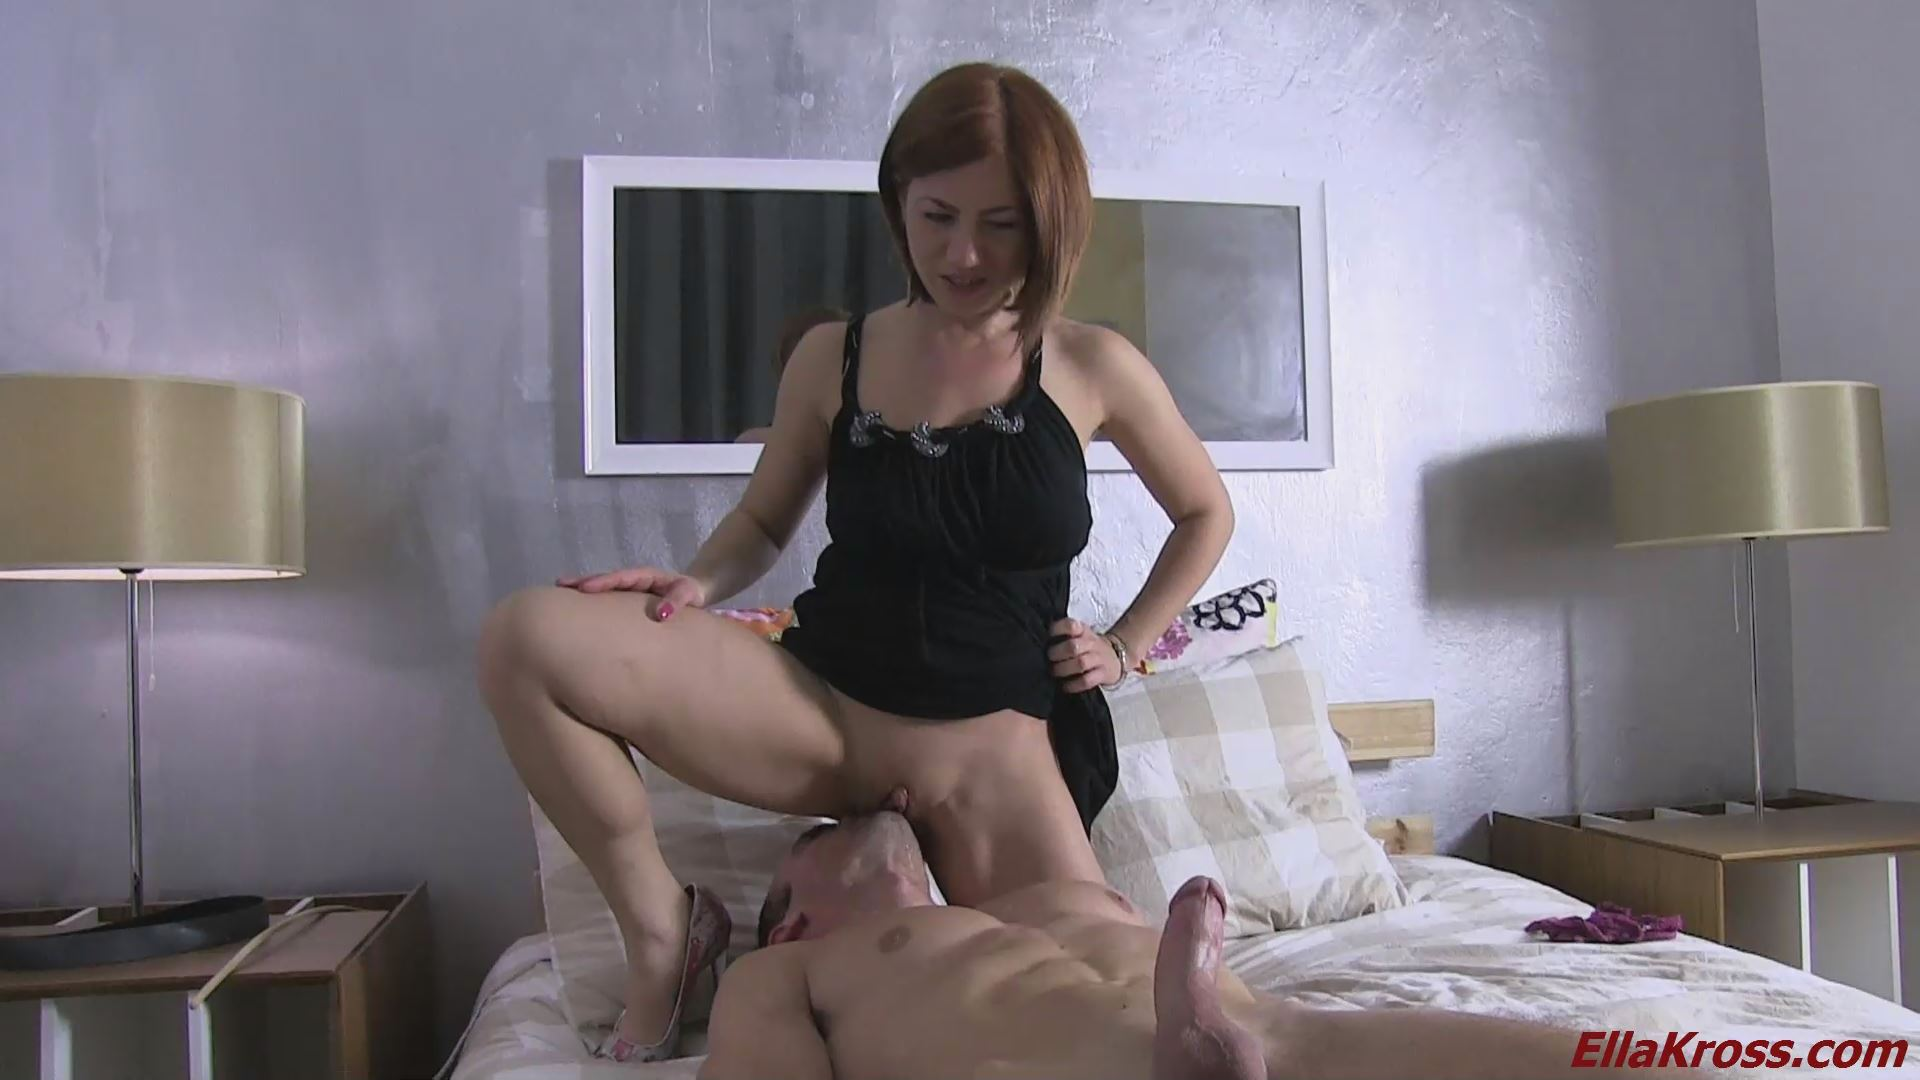 Ella Kross In Scene: Having Some Fun with the Repairman Part 4 - ELLAKROSS - FULL HD/1080p/MP4